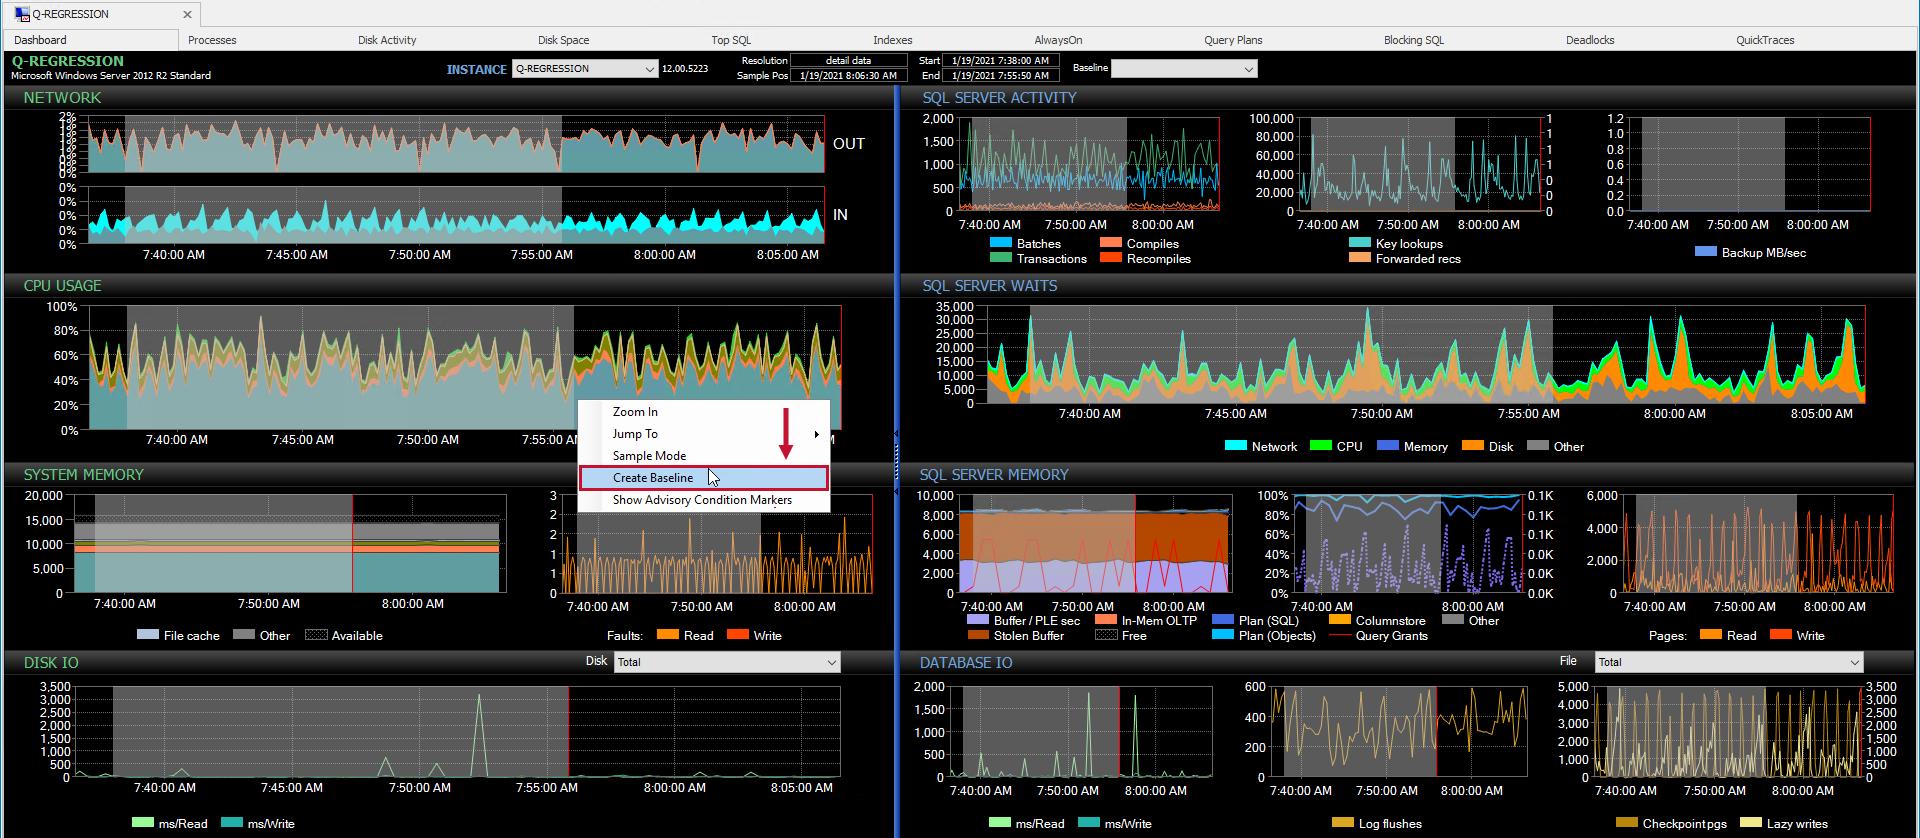 sentryone-performance-analysis-dashboard-create-baseline-2021